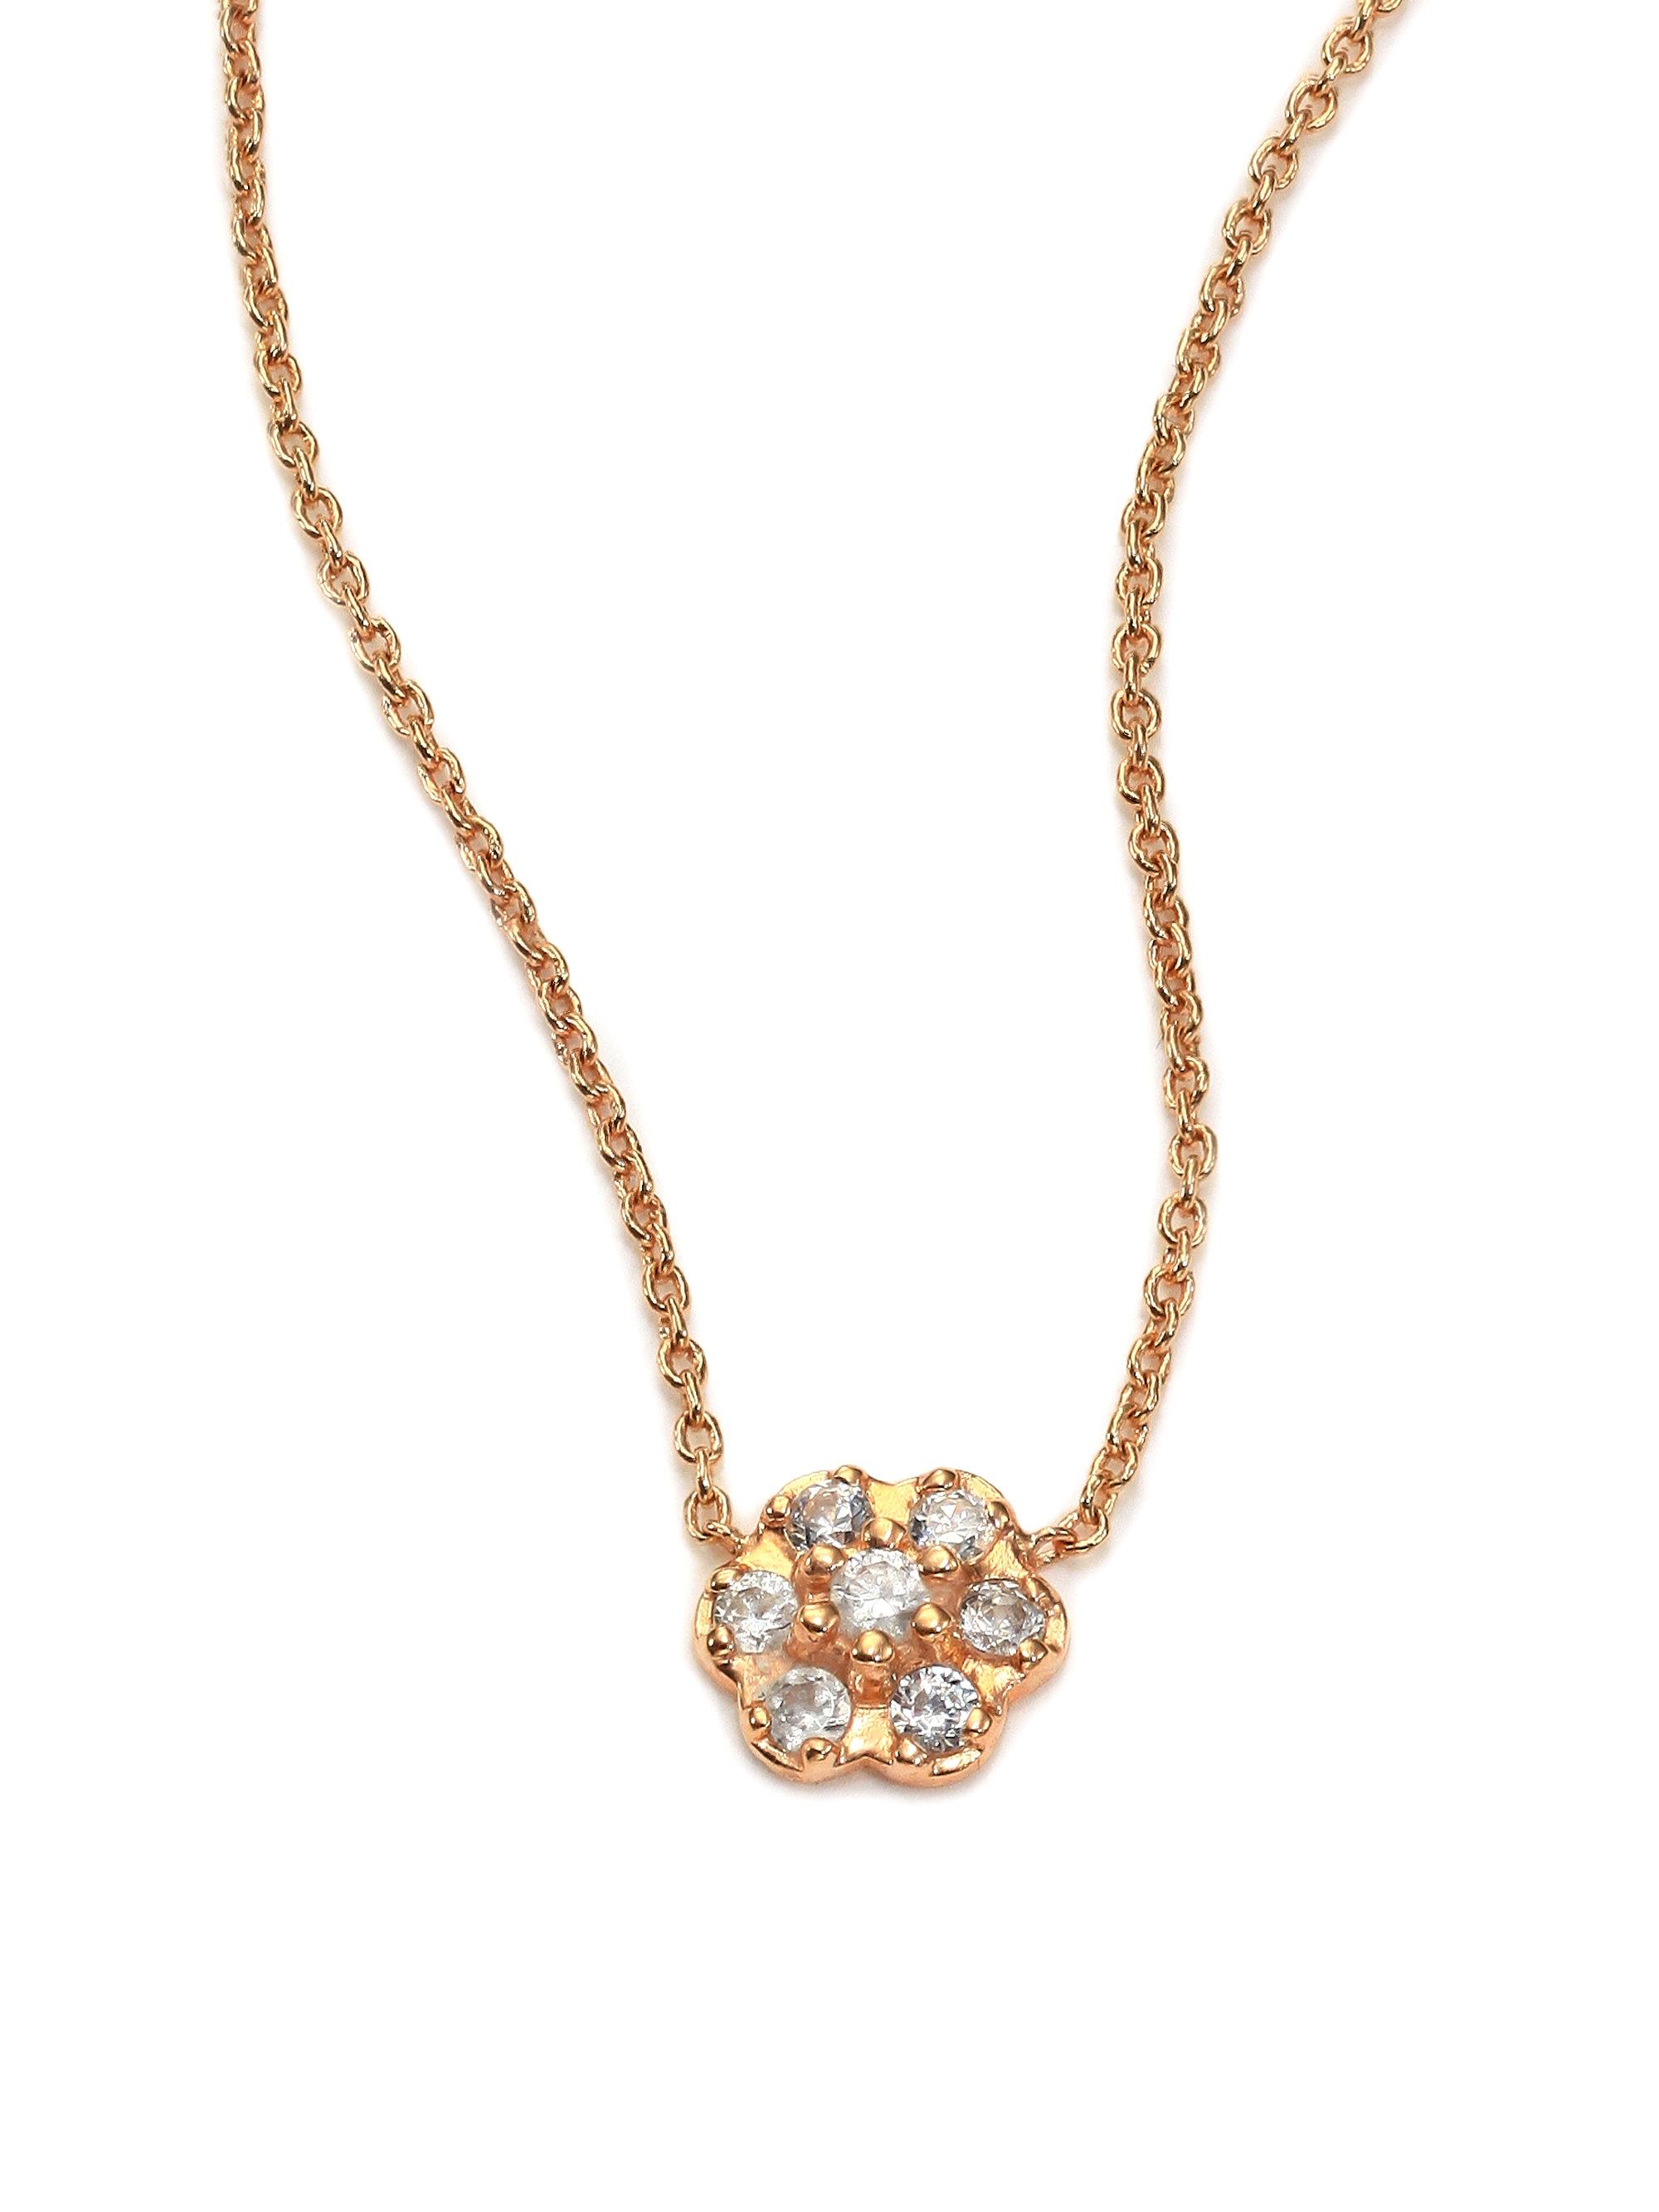 Ginette NY Lotus Mini Diamond gold and diamond neckalce Yq8kbSp6